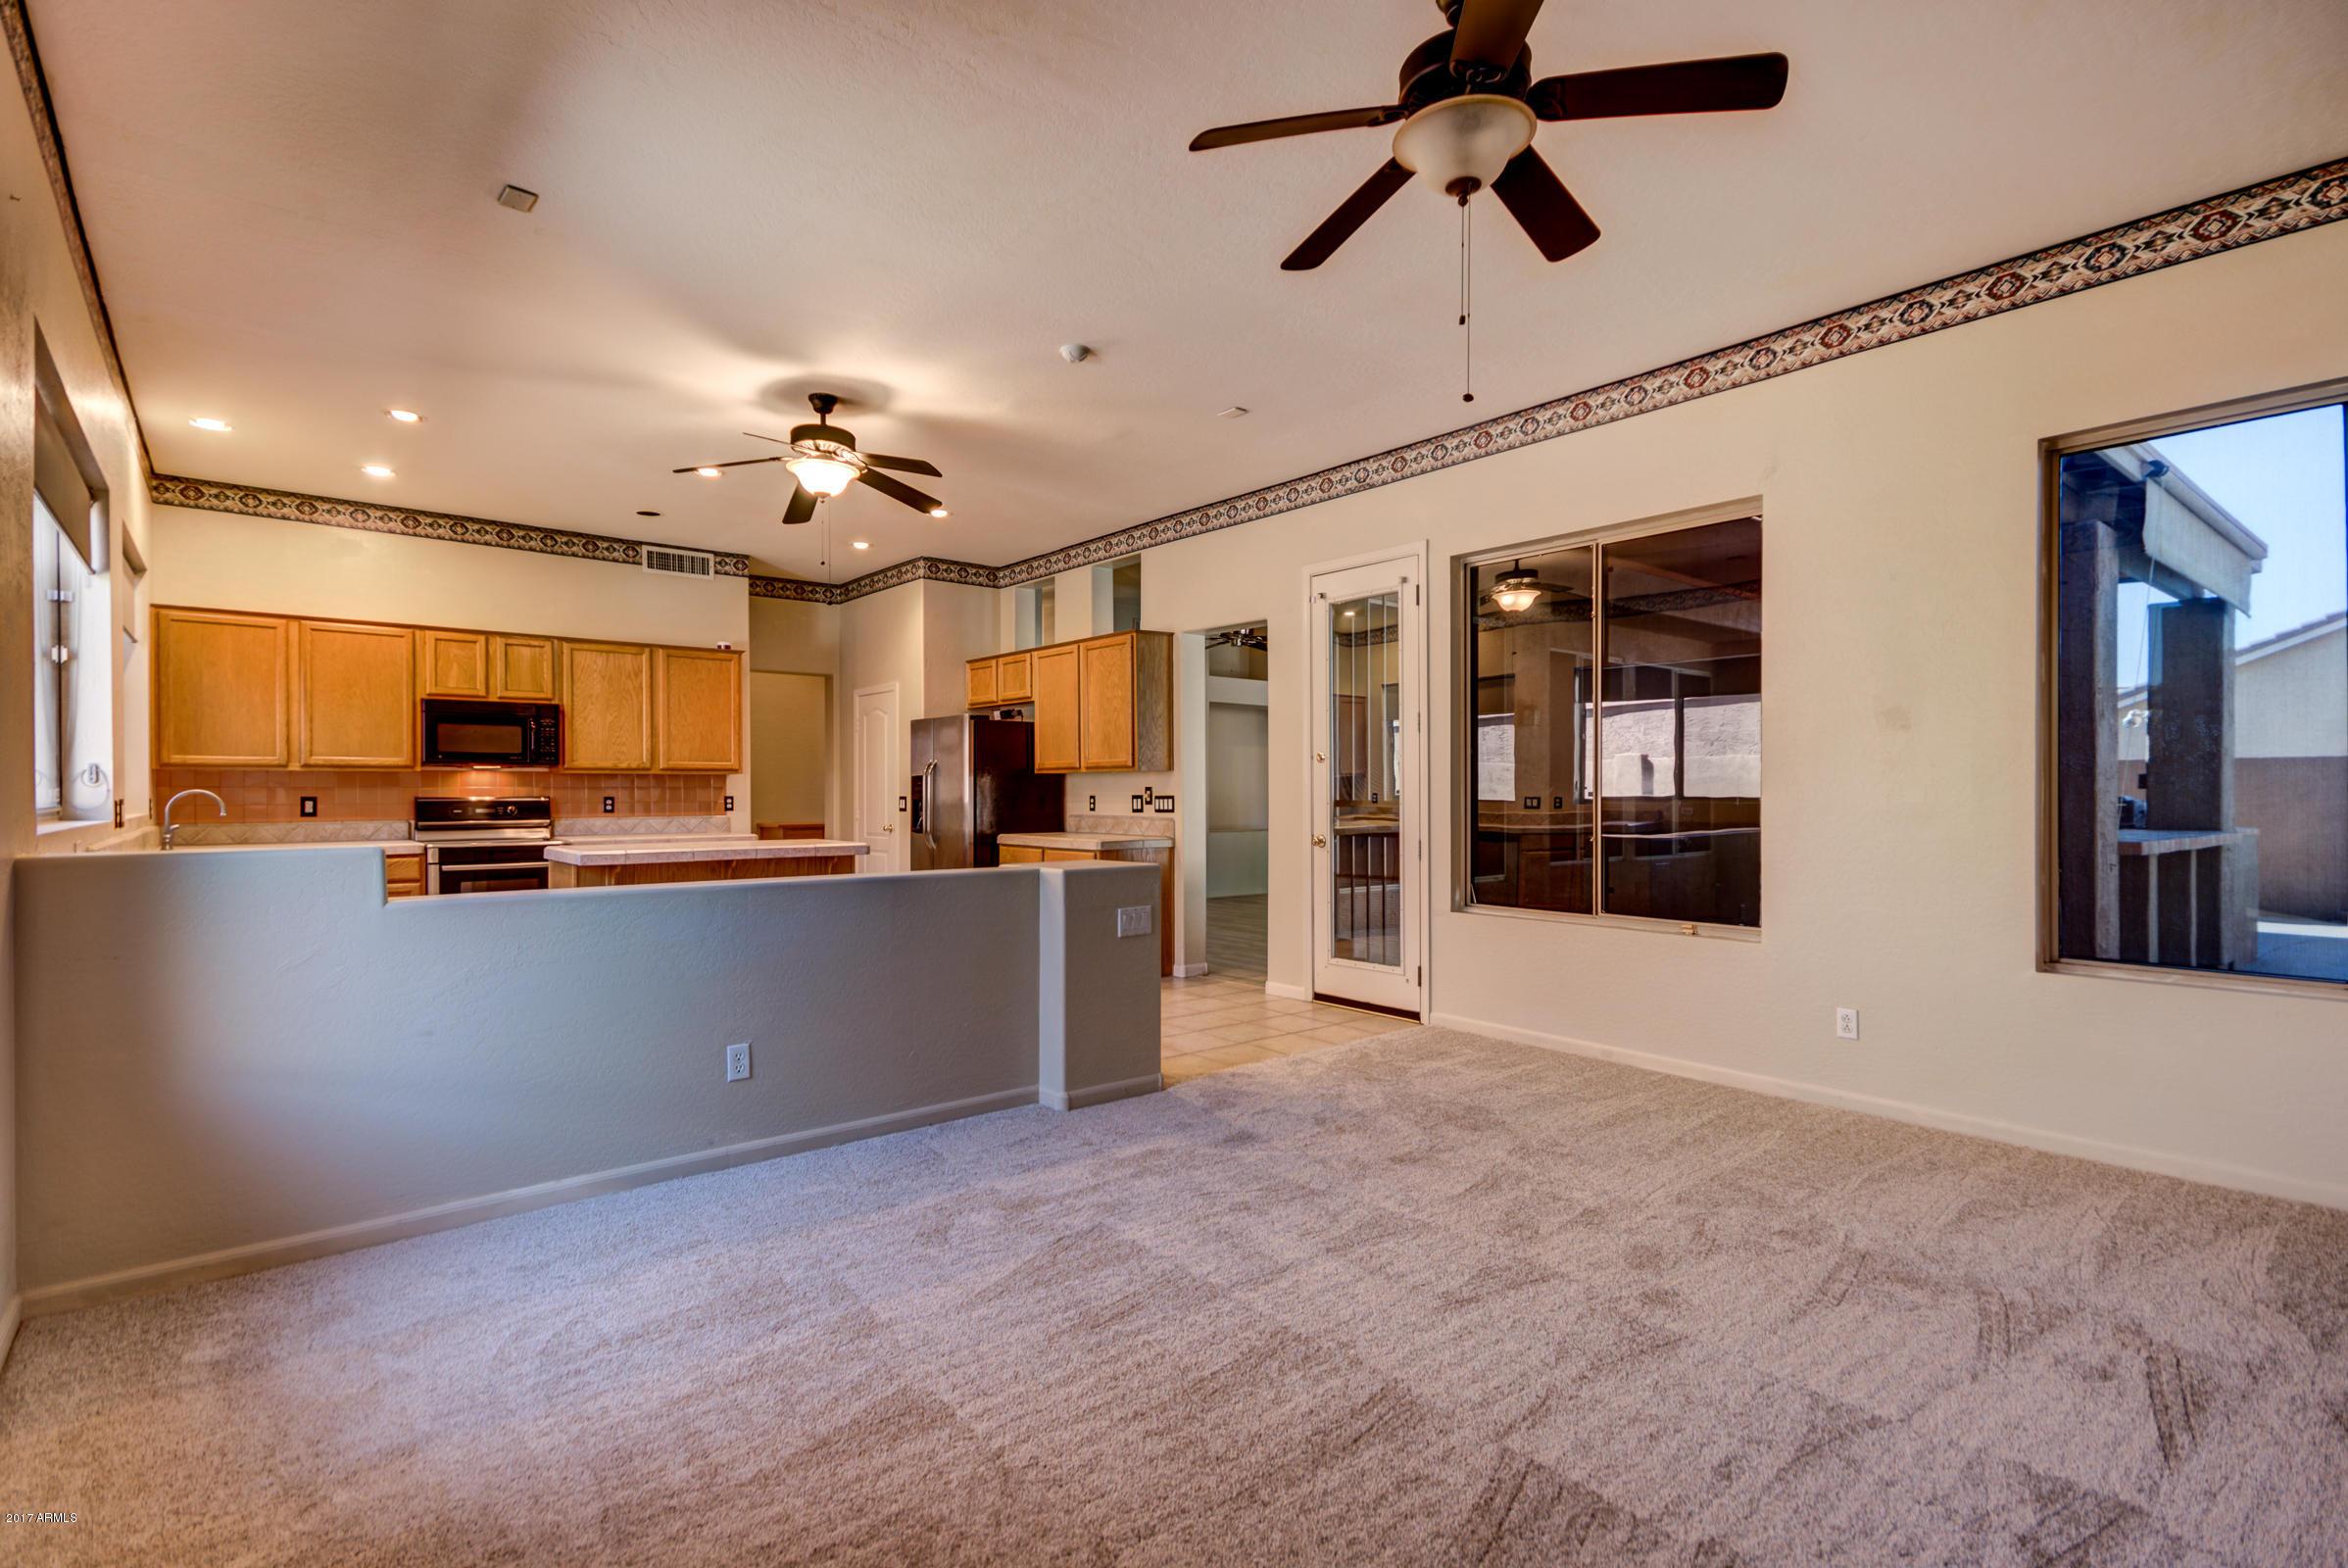 304 S Ironwood  Street Gilbert, AZ 85296 - img21